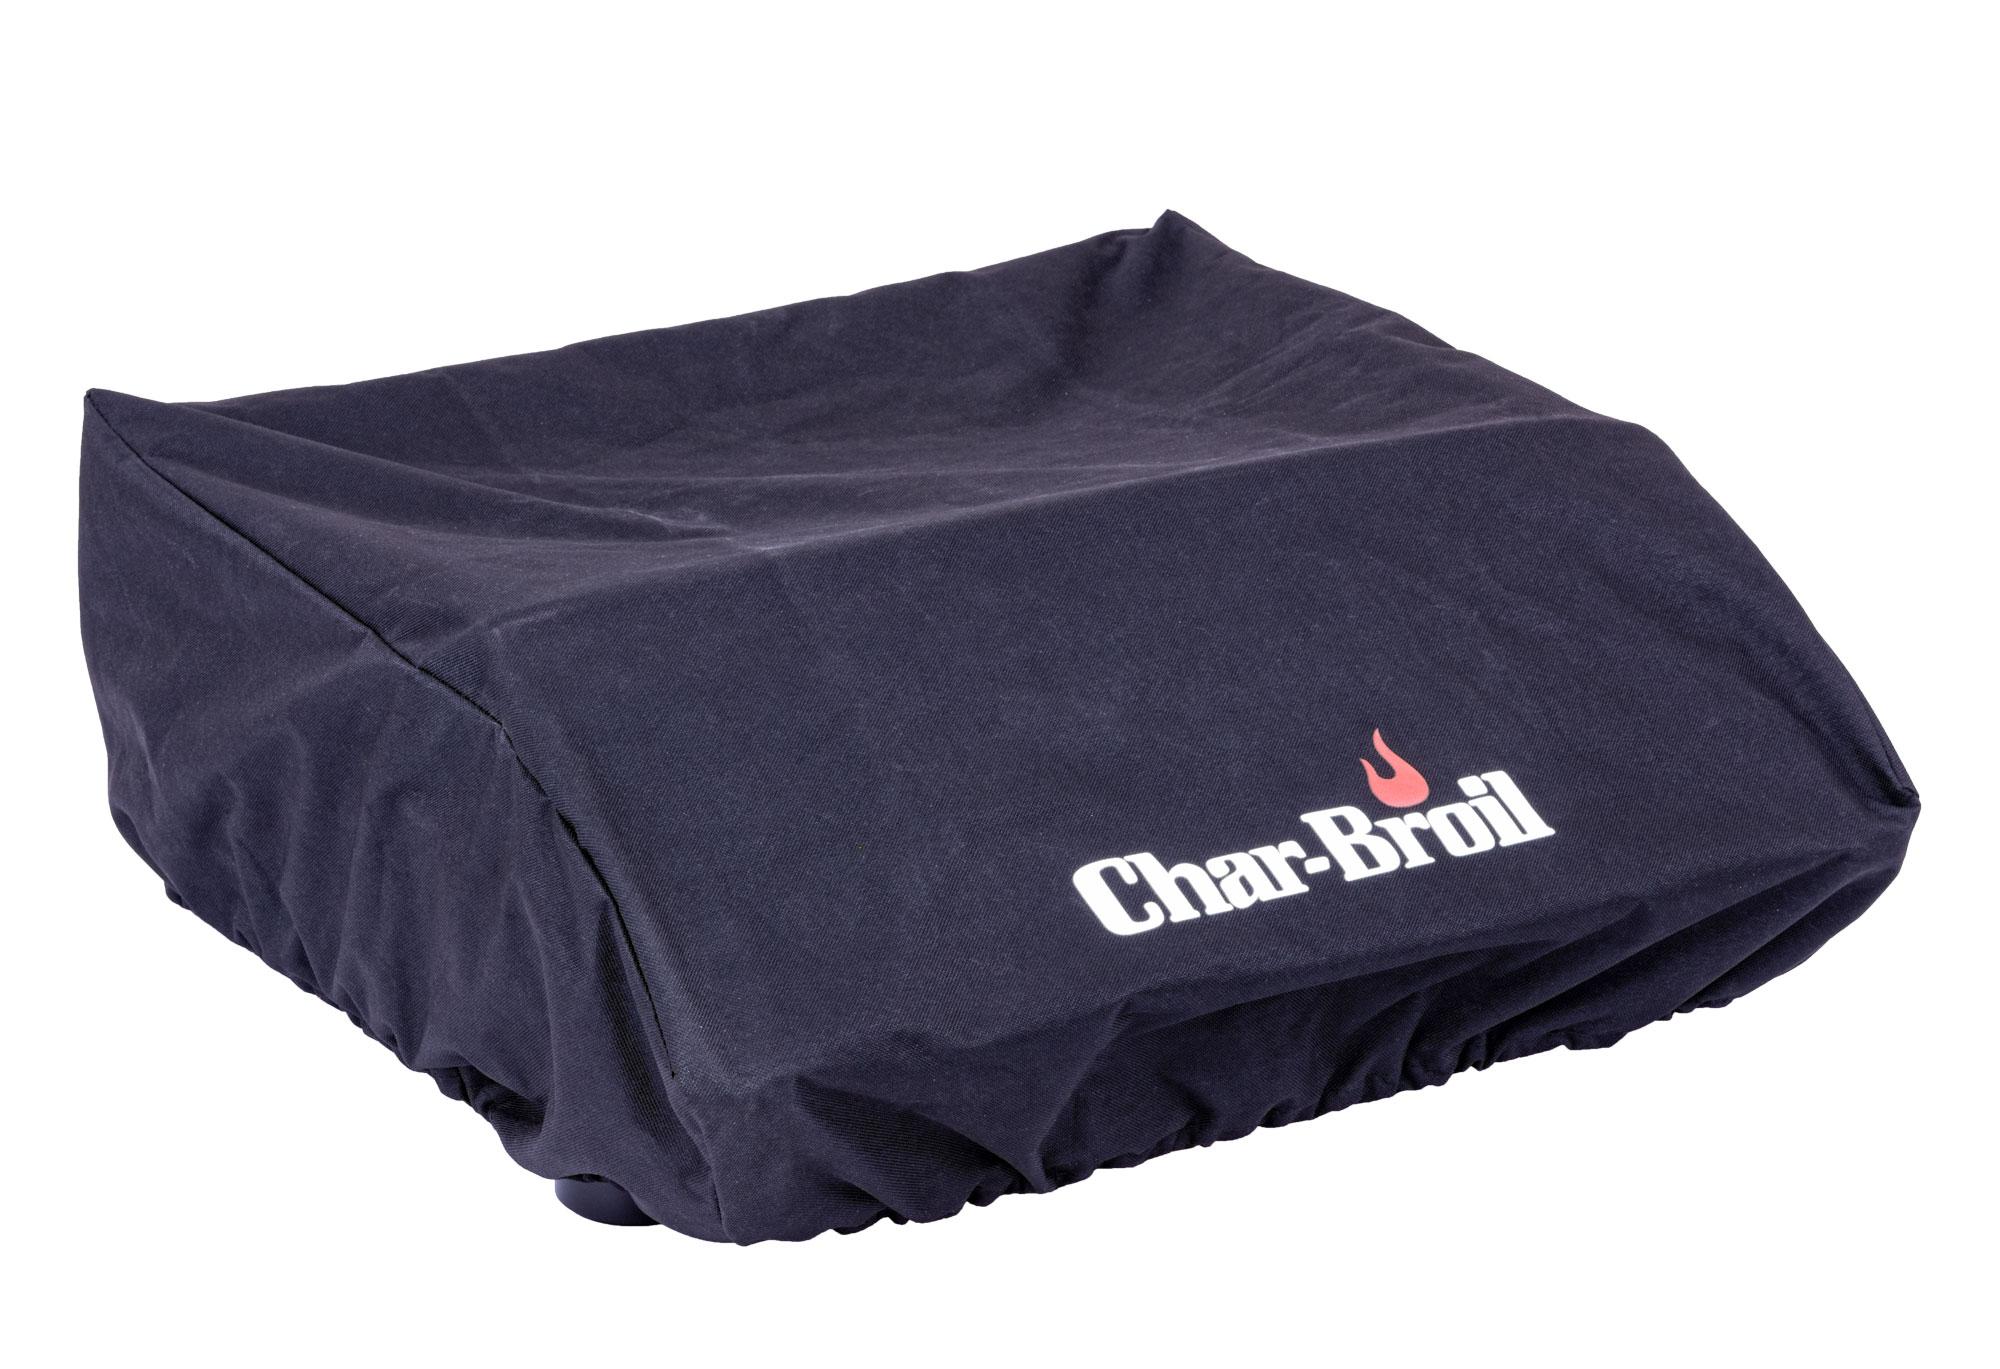 Char-Broil Schutzhülle für Plancha Grill Verano 200 Bild 3